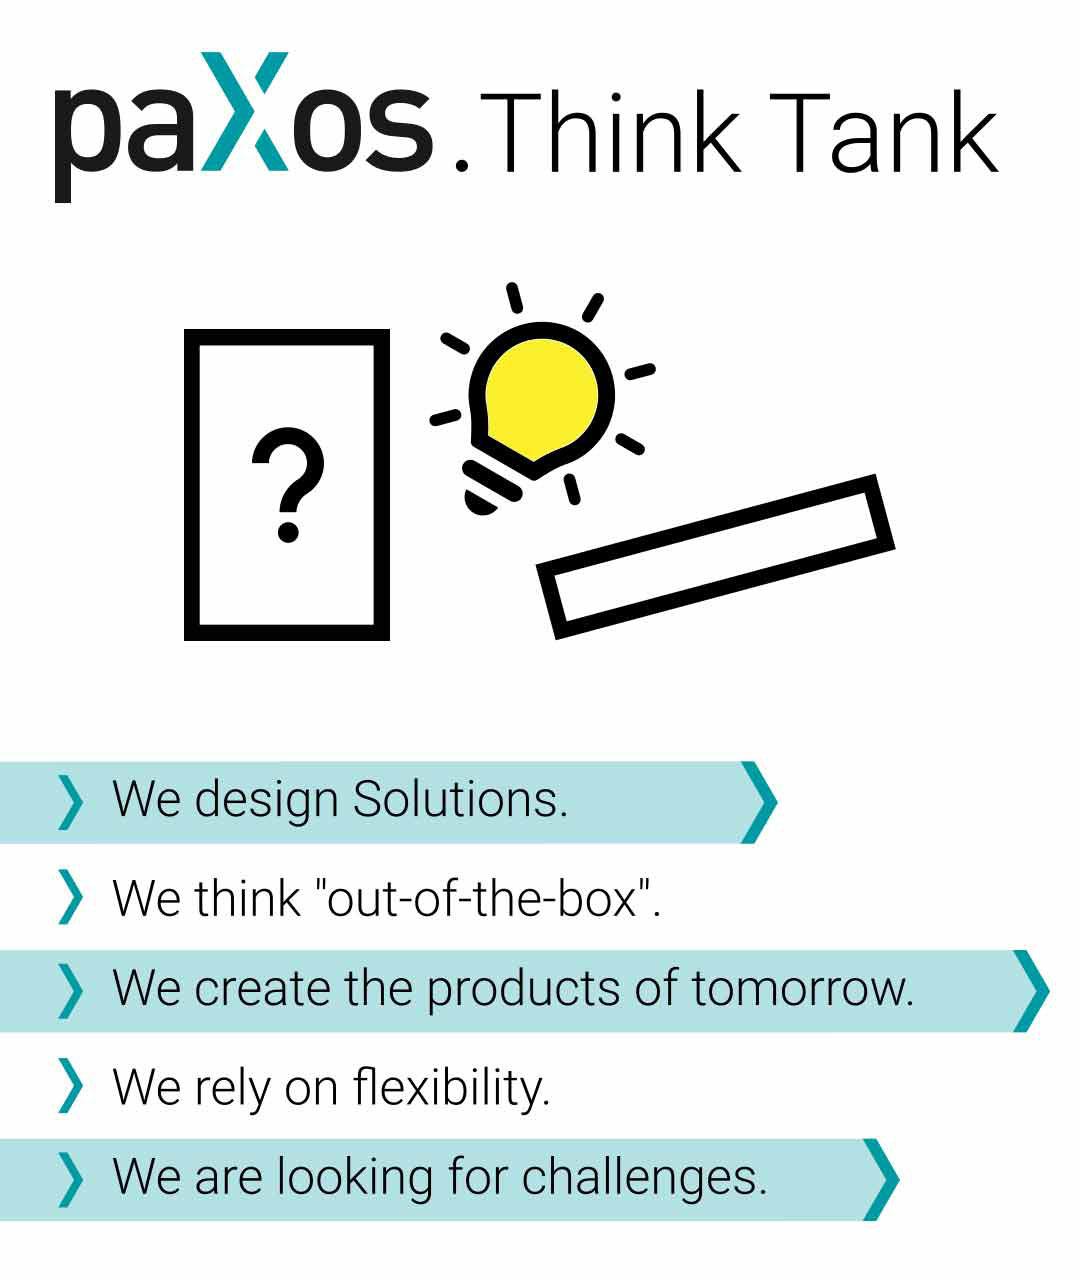 paXos as Think Tank